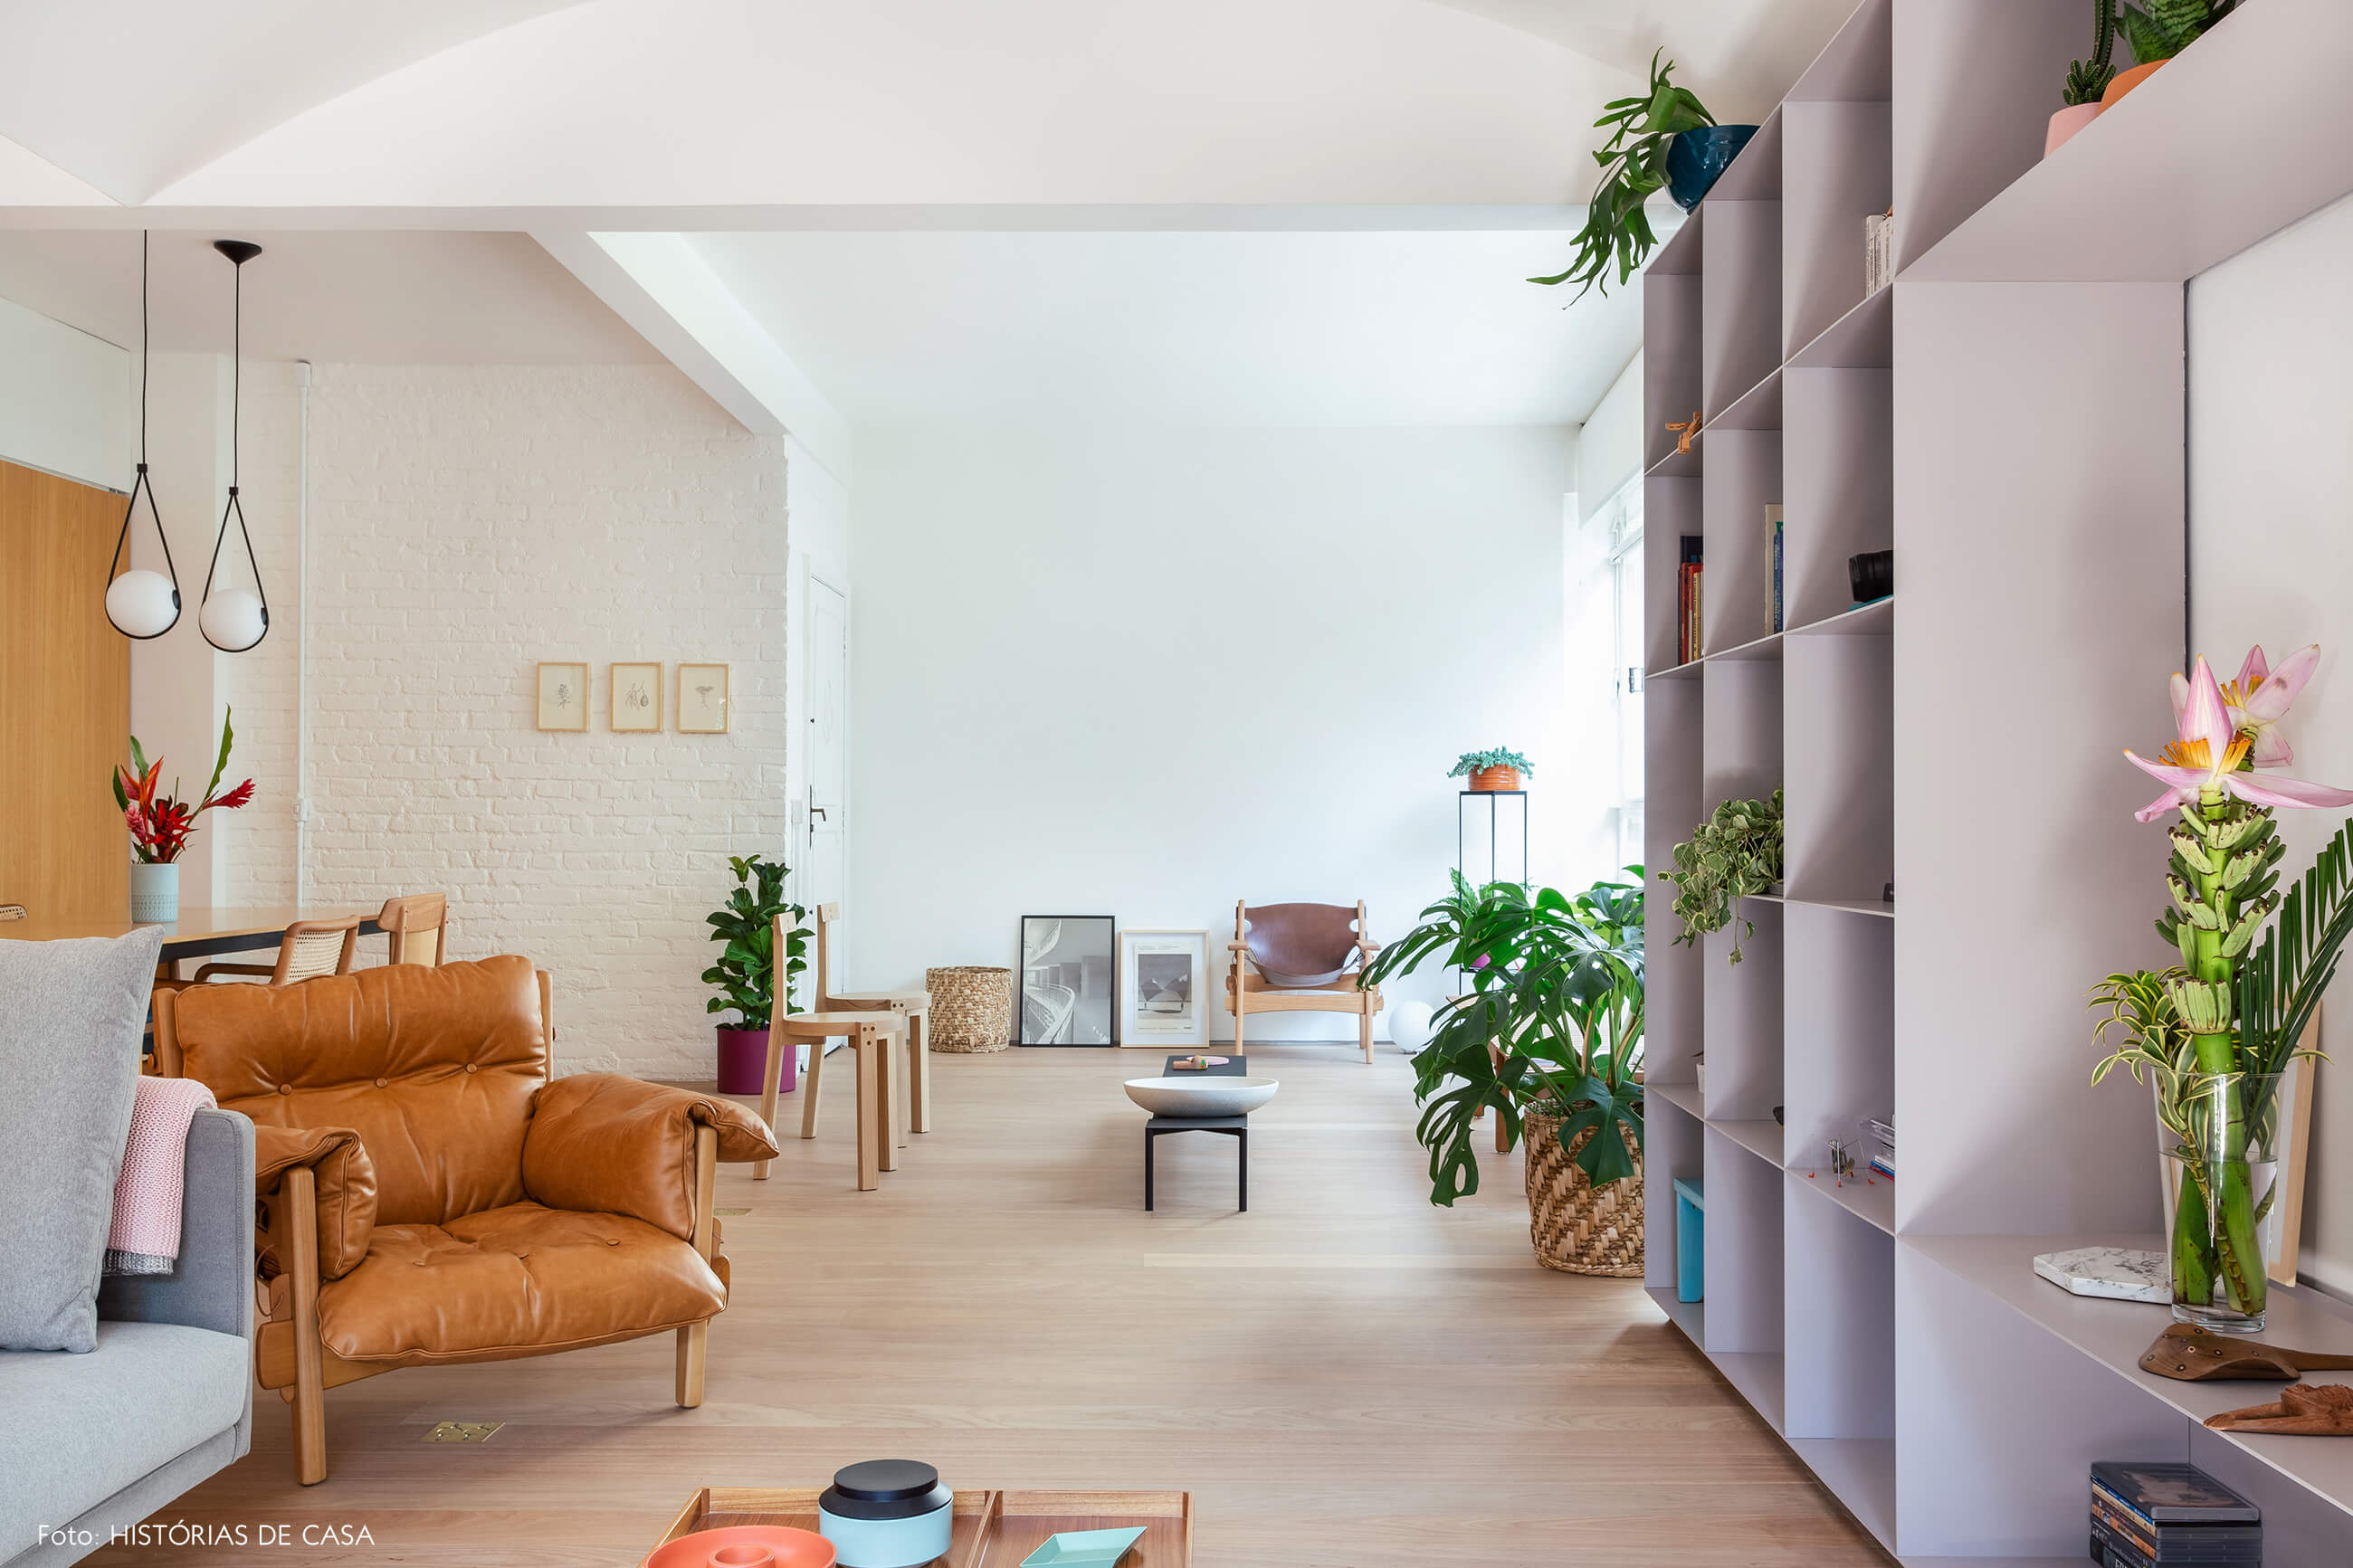 09-decoracao-apartamento-sala-integrada-piso-de-madeira-clara